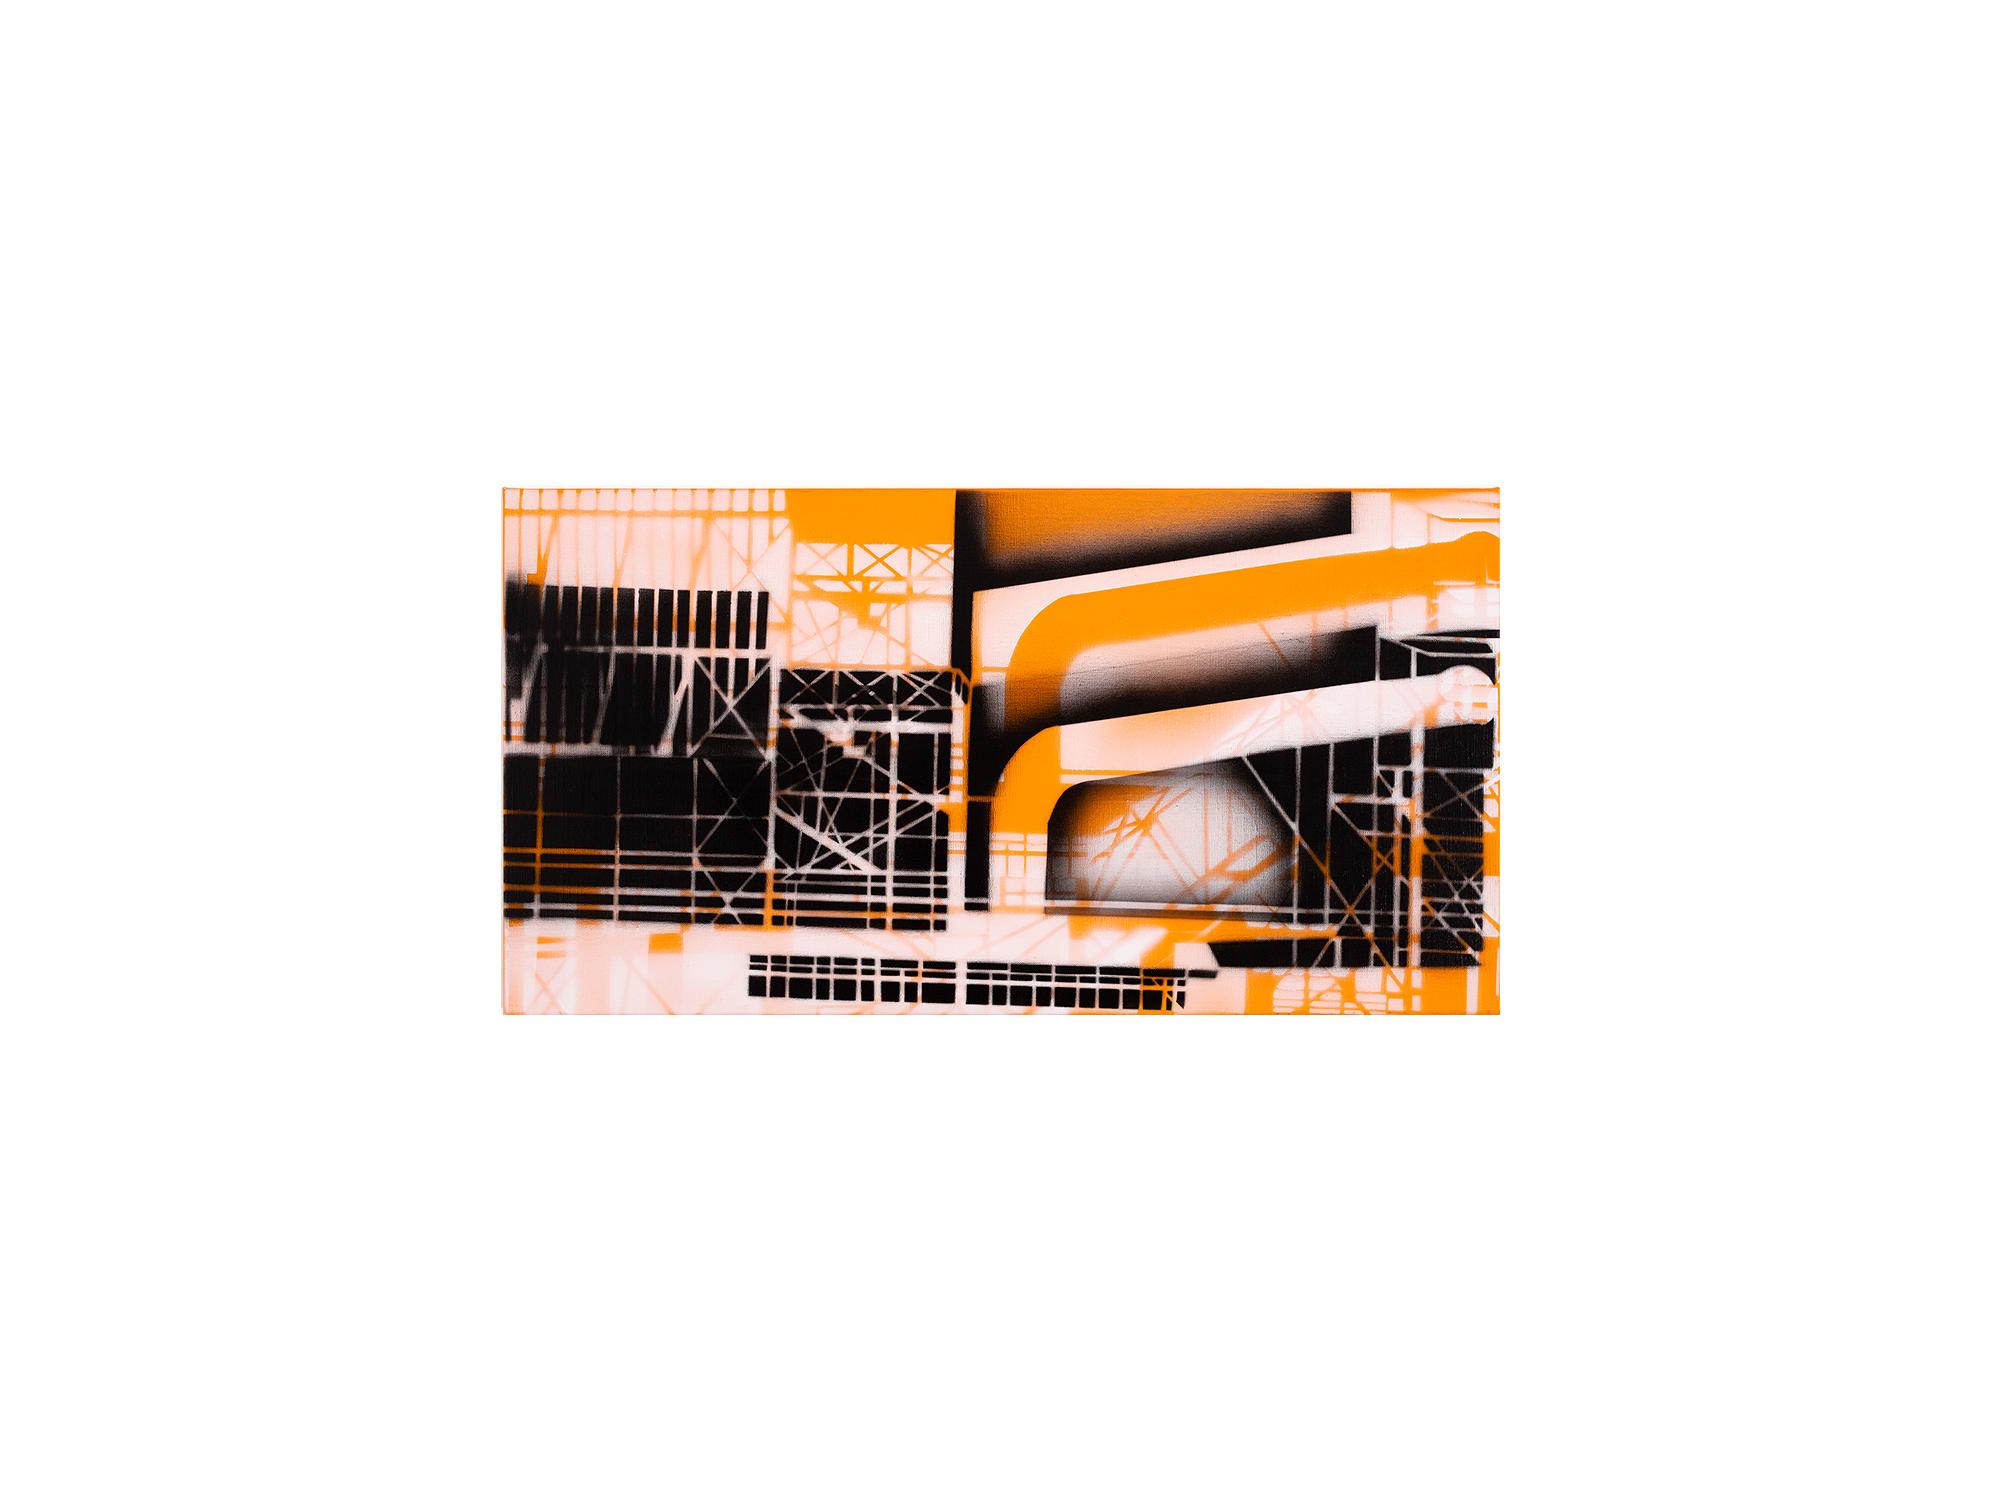 Louise Forthun   The Tilt,  2018 acrylic on linen 40 x 76cm   ARTIST BIO